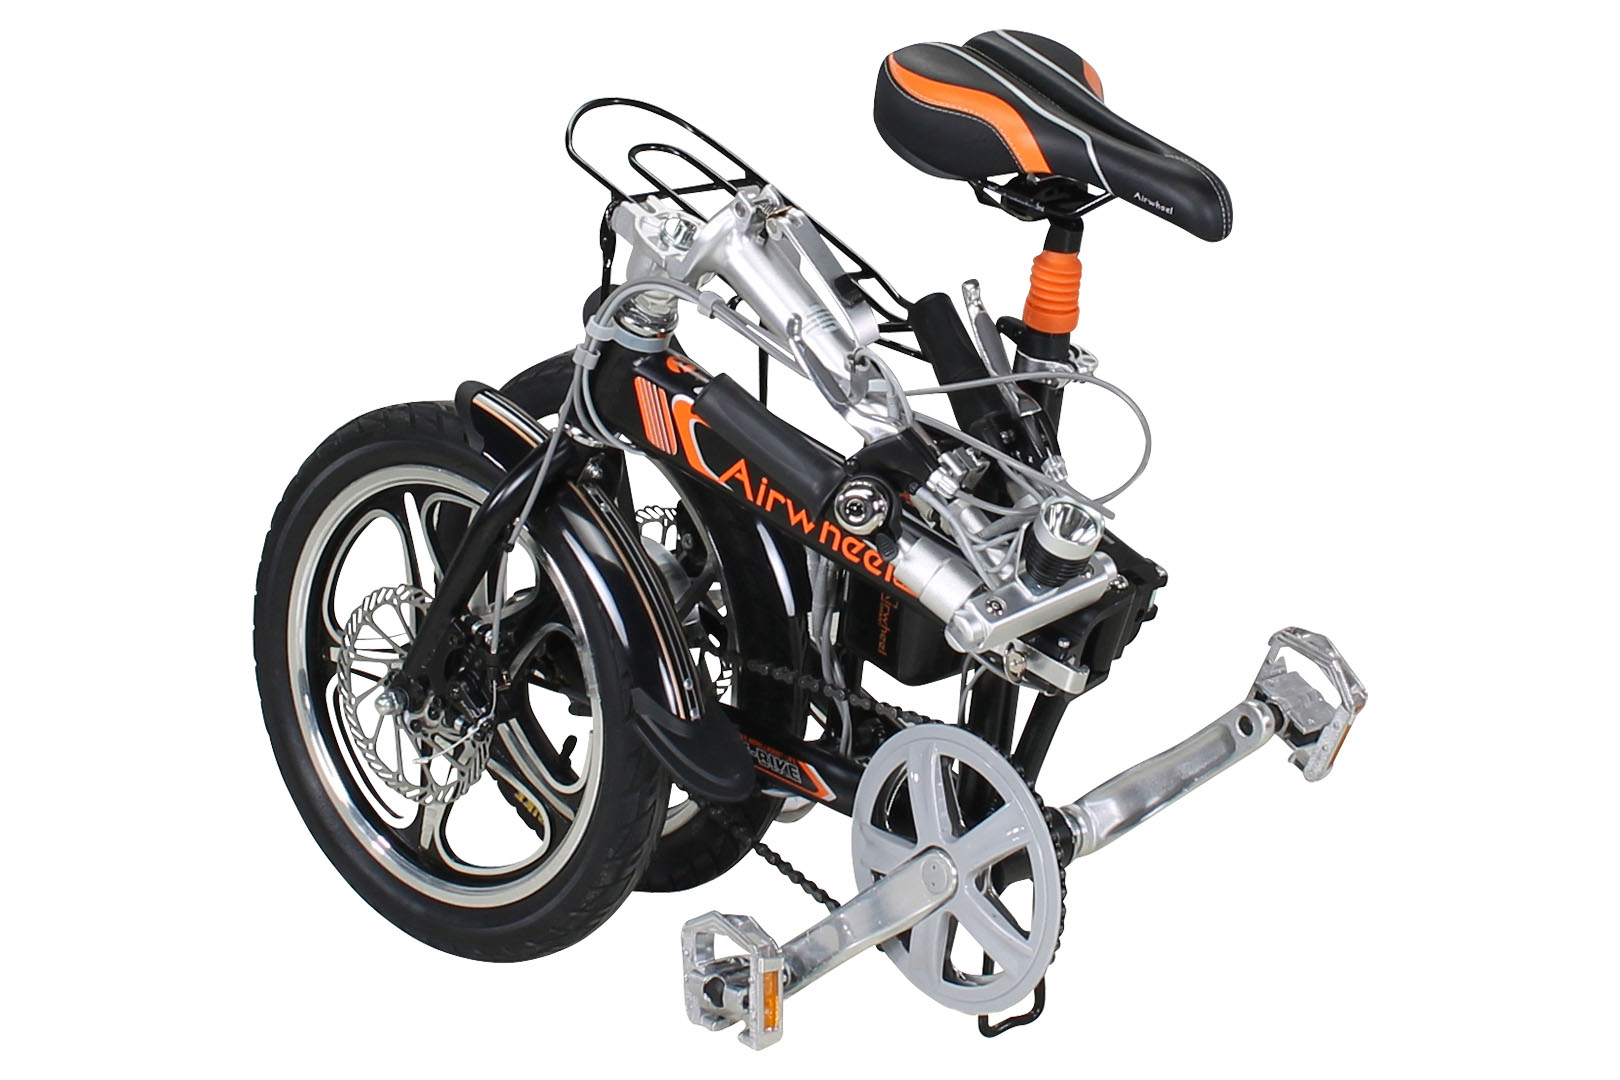 airwheel r5 faltbares e bike aluminium klapprad elektrofahrrad citybike pedelec ebay. Black Bedroom Furniture Sets. Home Design Ideas